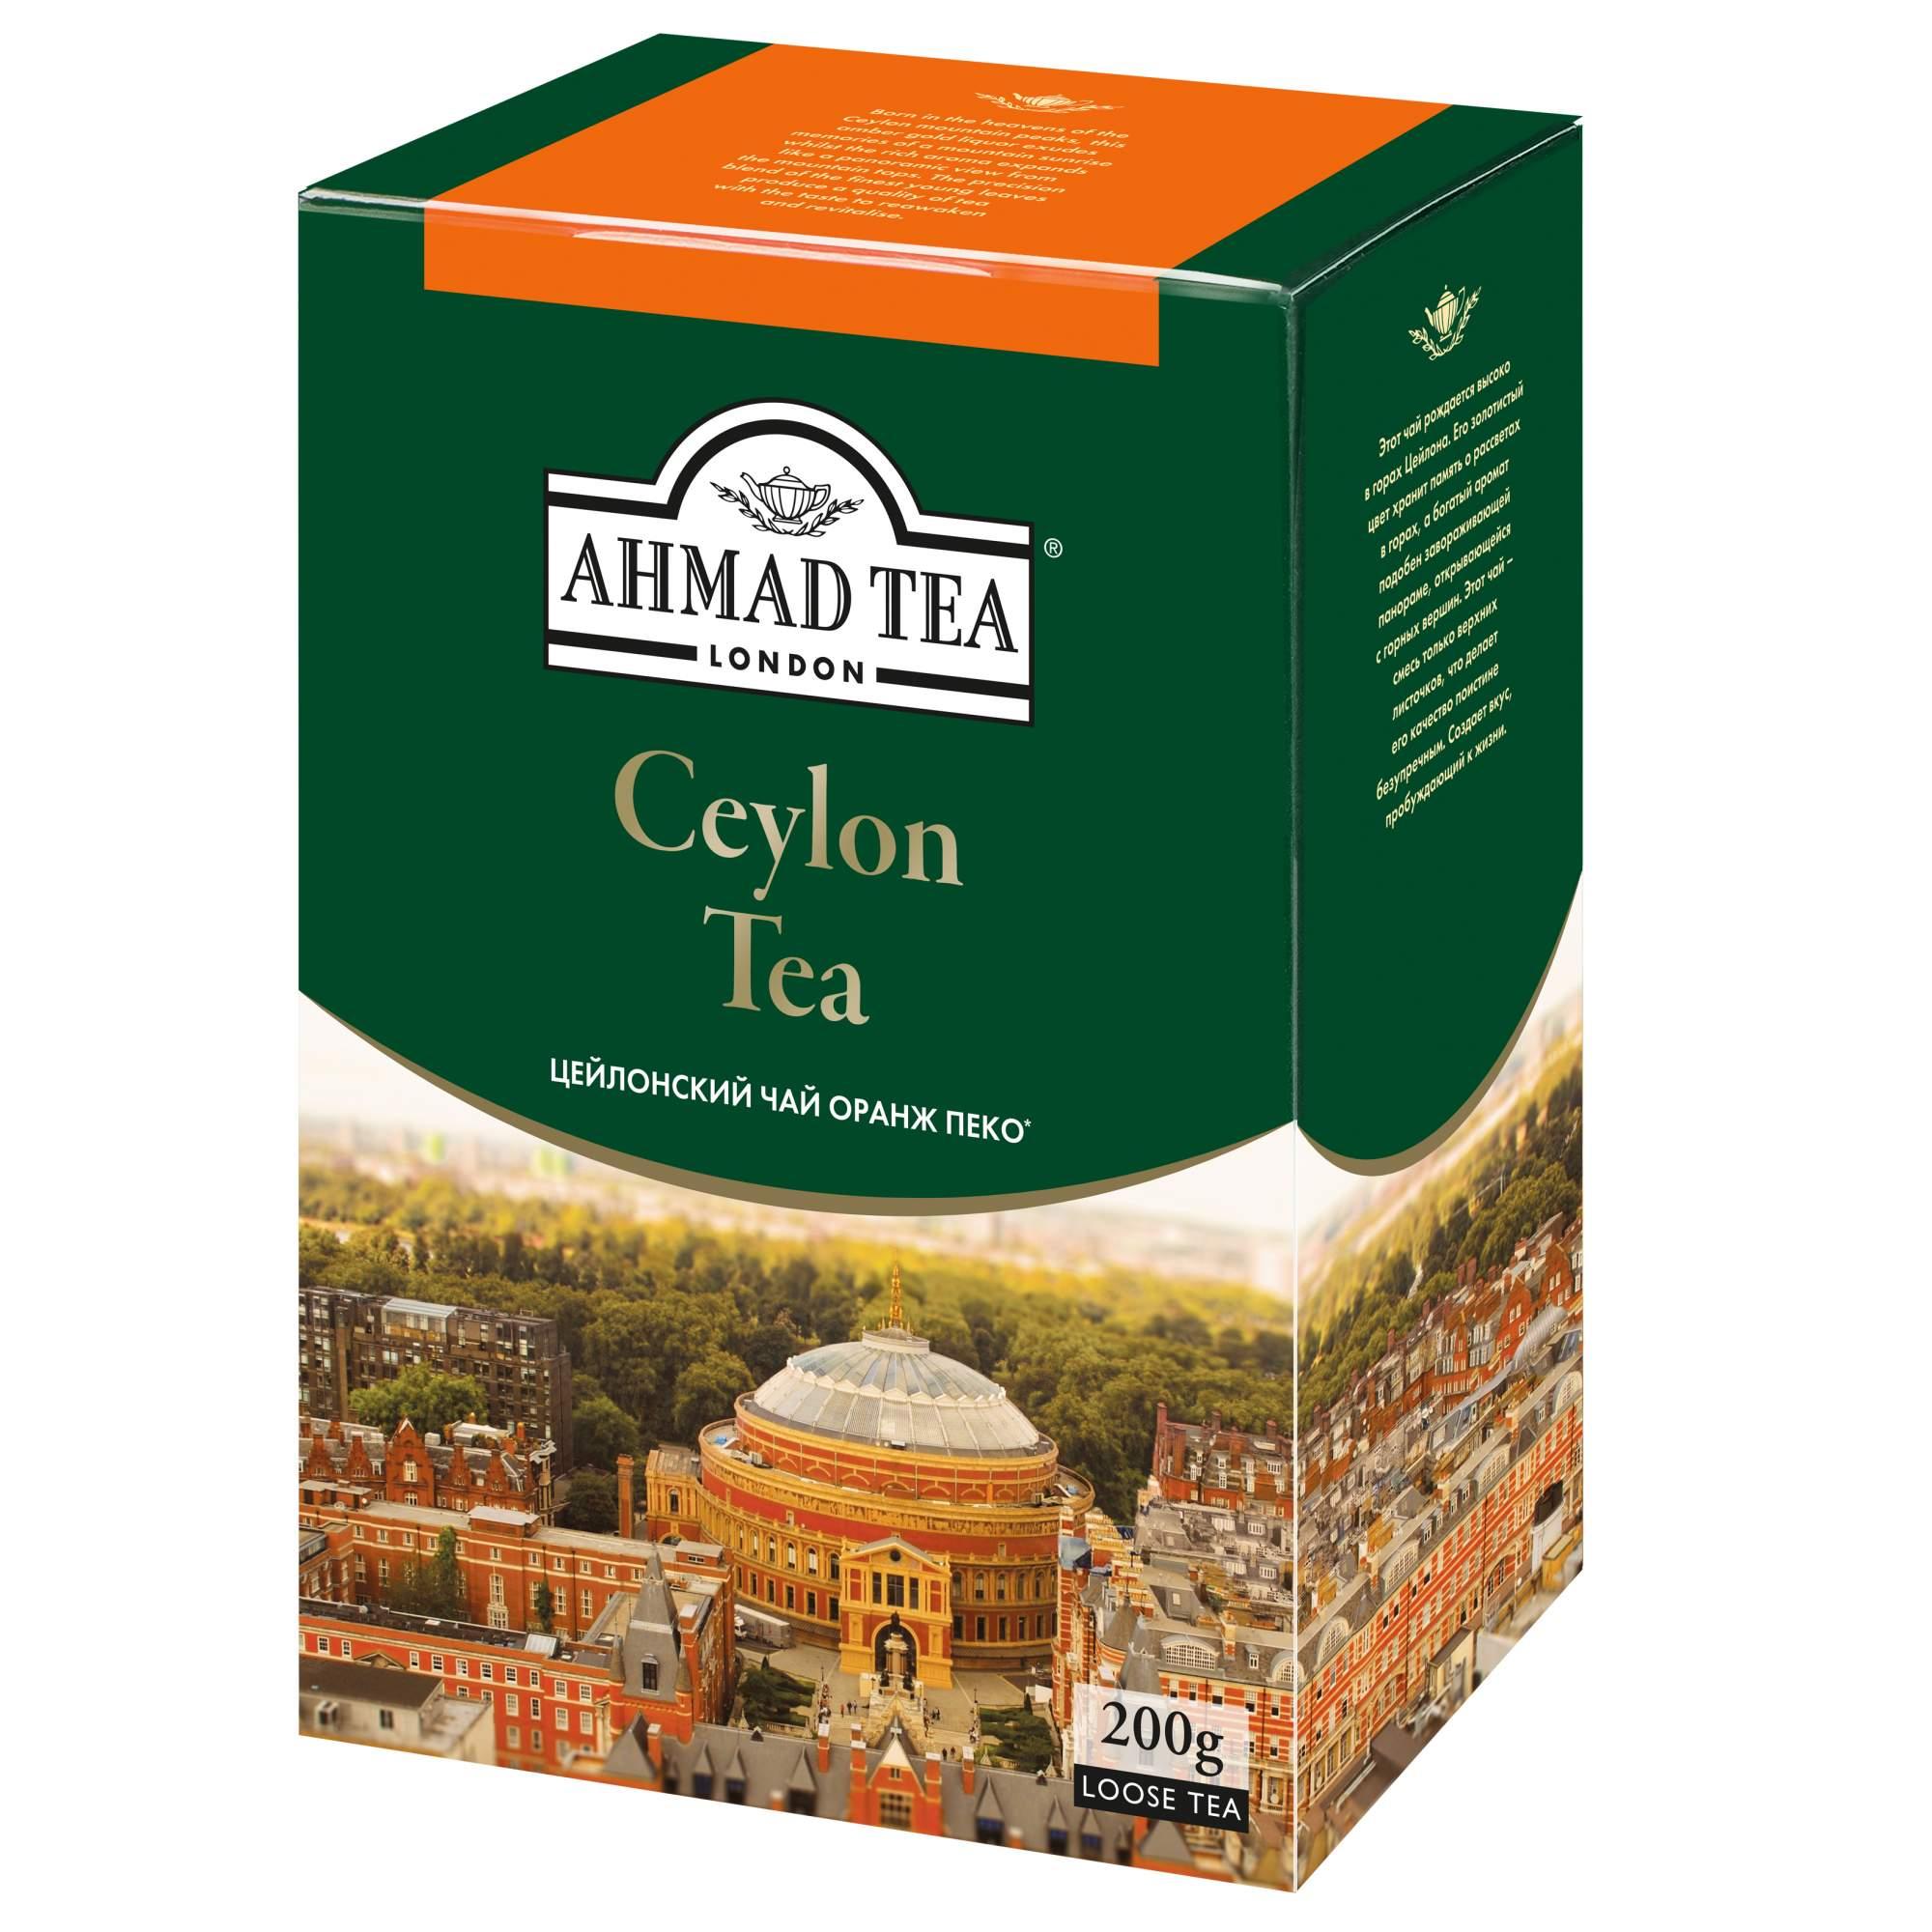 Чай черный Ahmad Tea ceylon оранж пеко 200 г